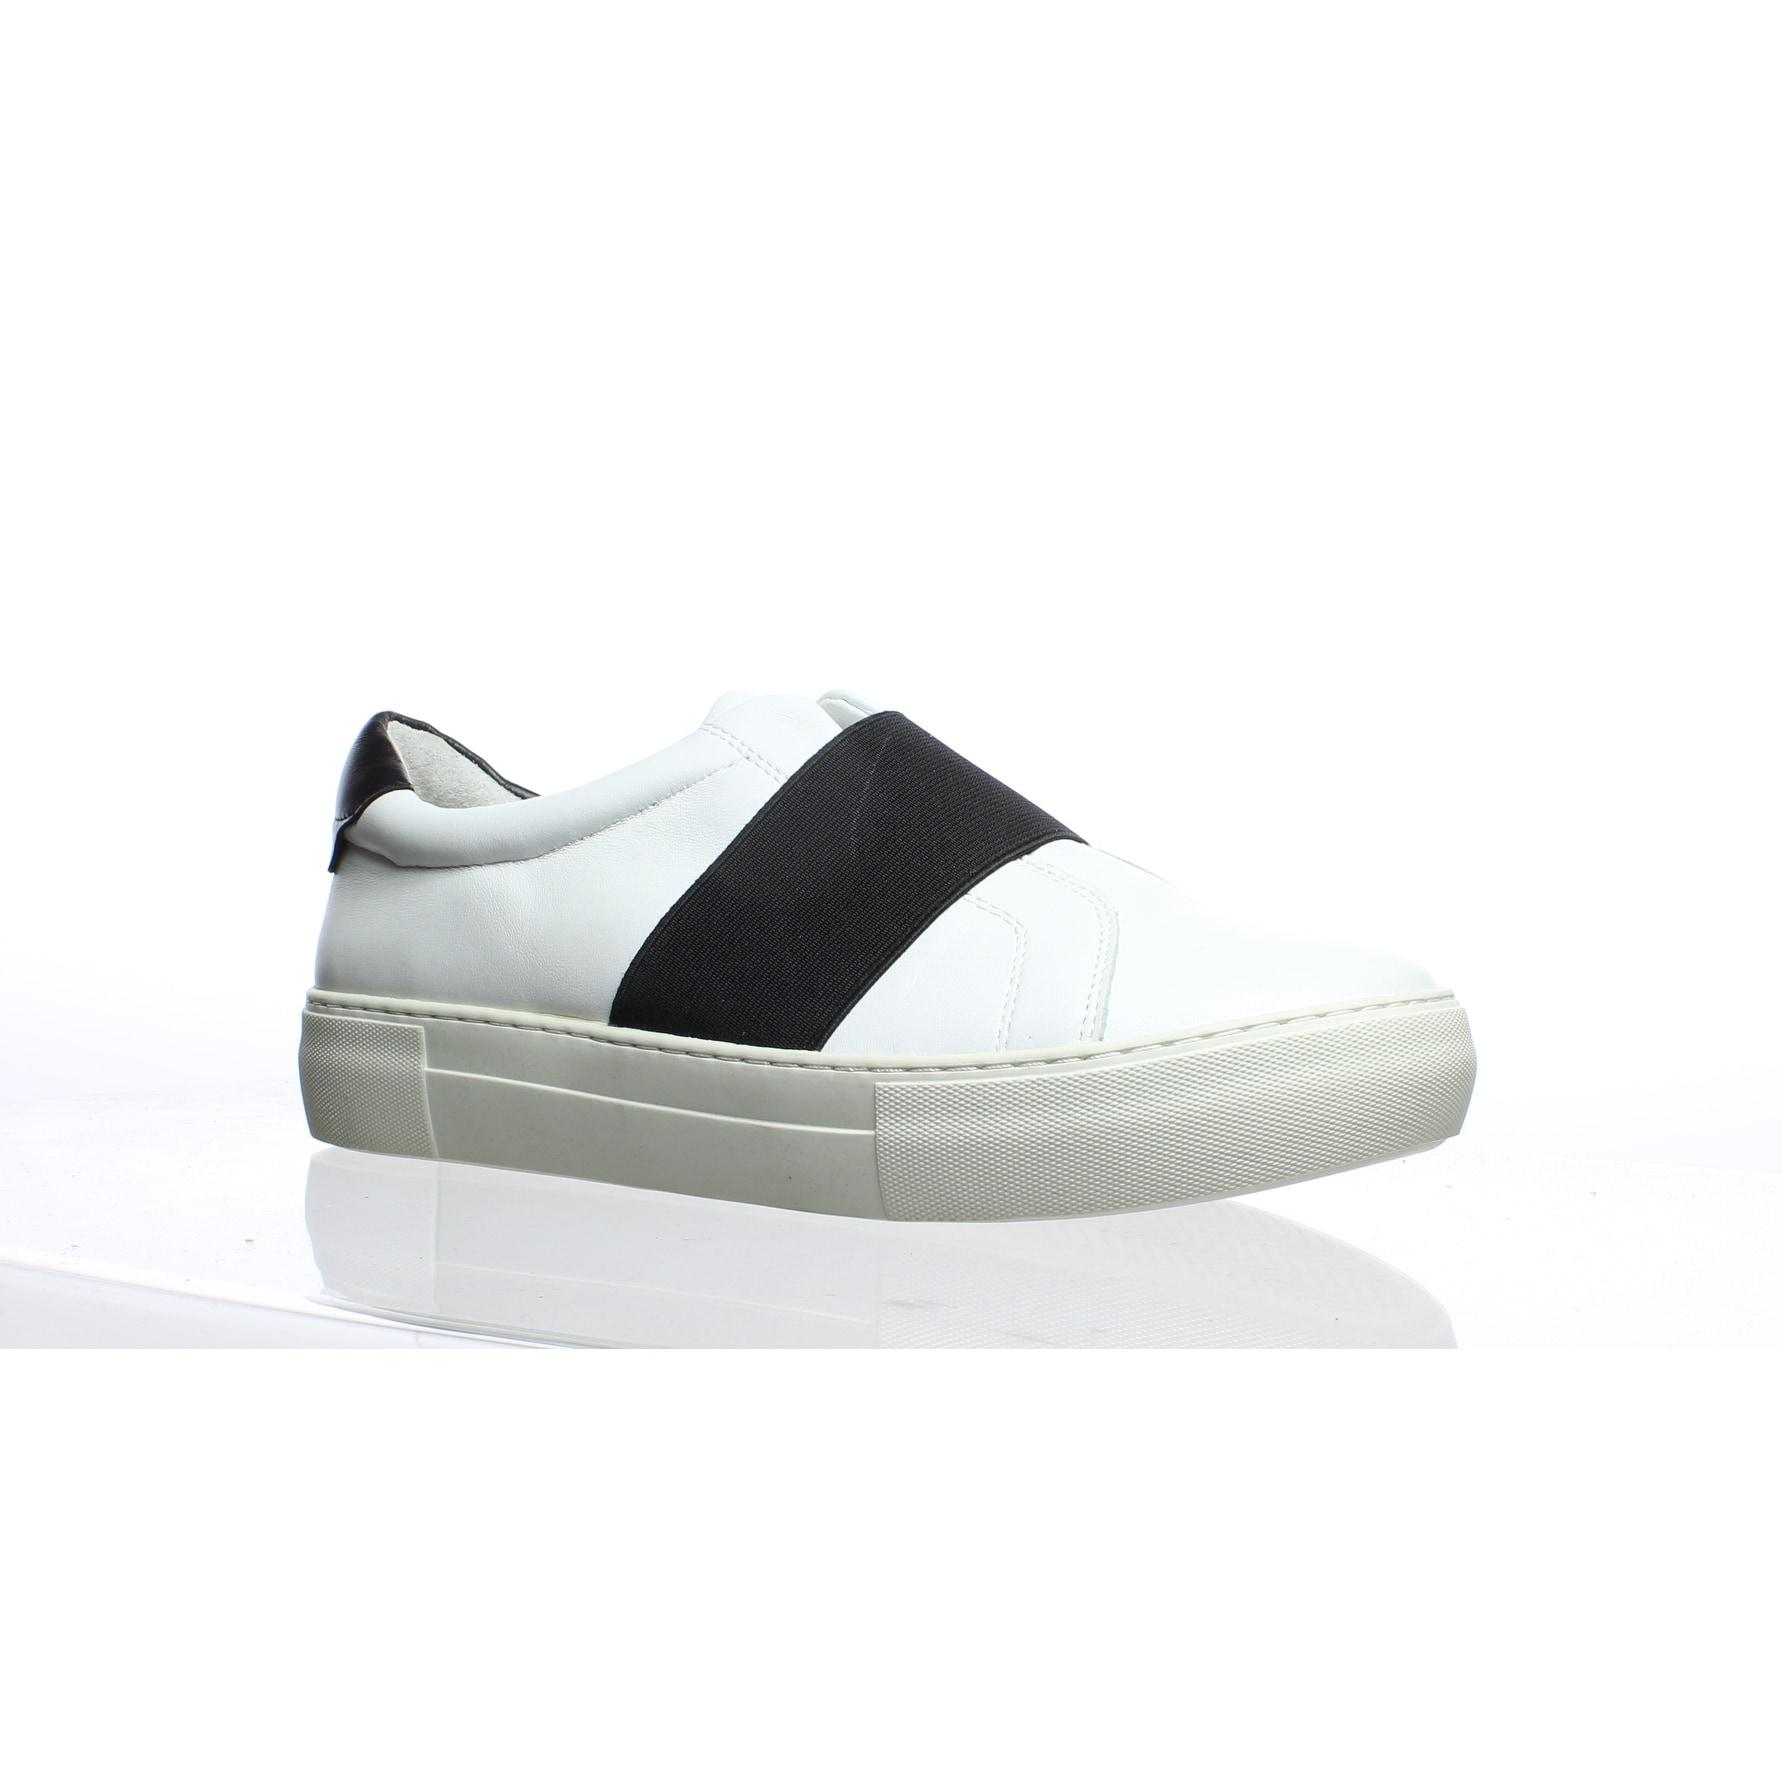 Shop J/slides Womens Adorn White/Black